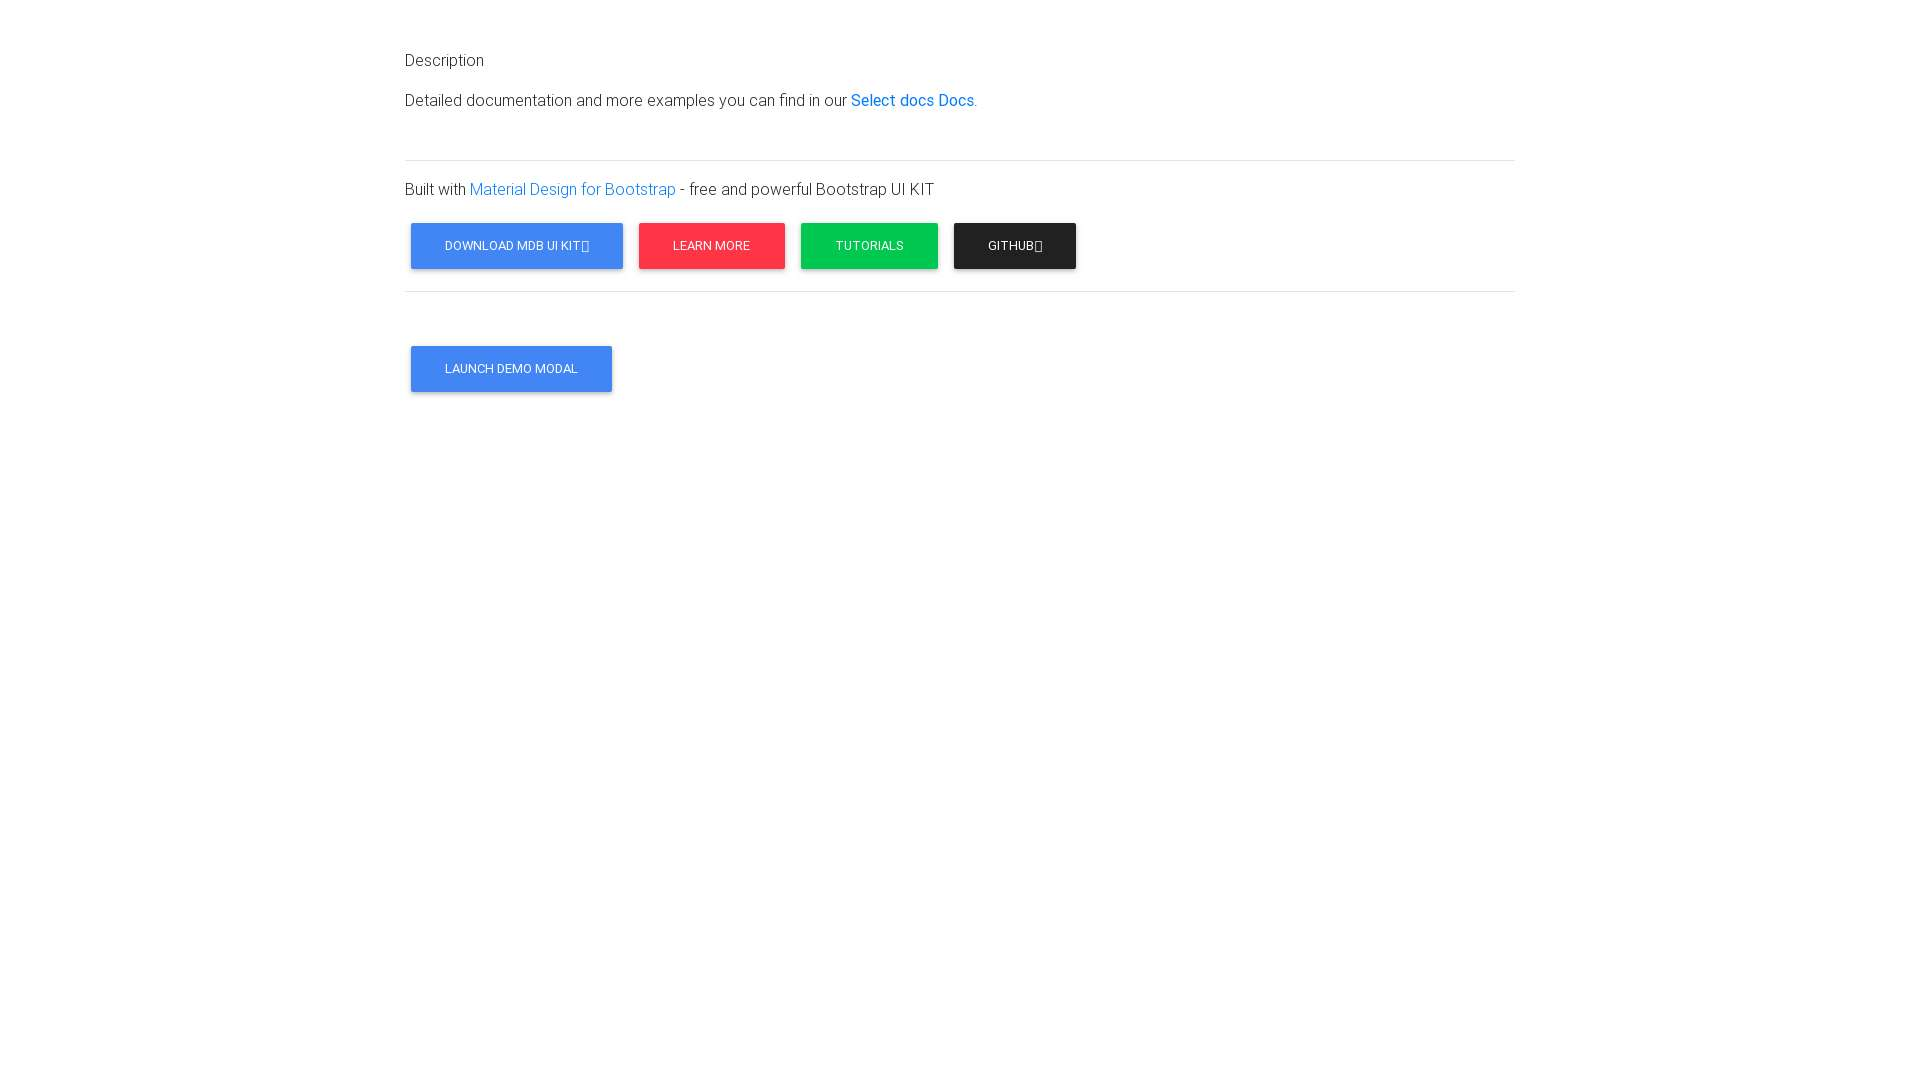 Search select